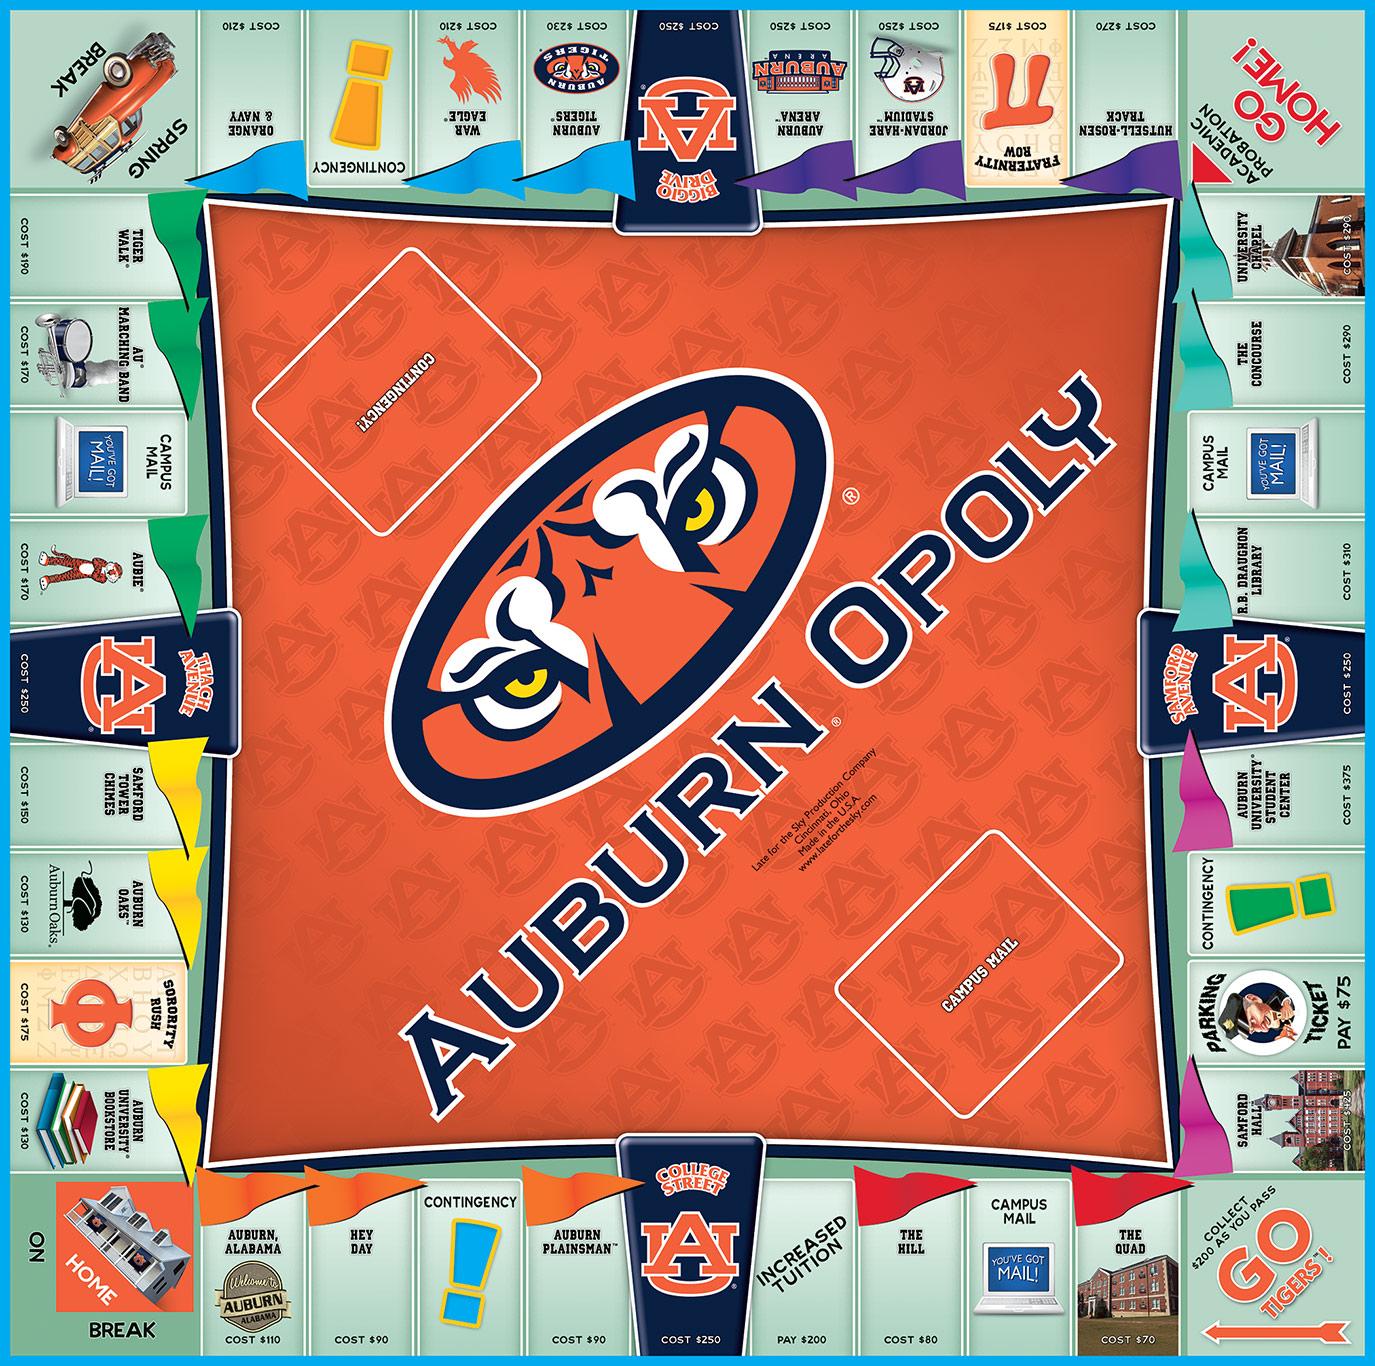 AUBURNOPOLY Board Game